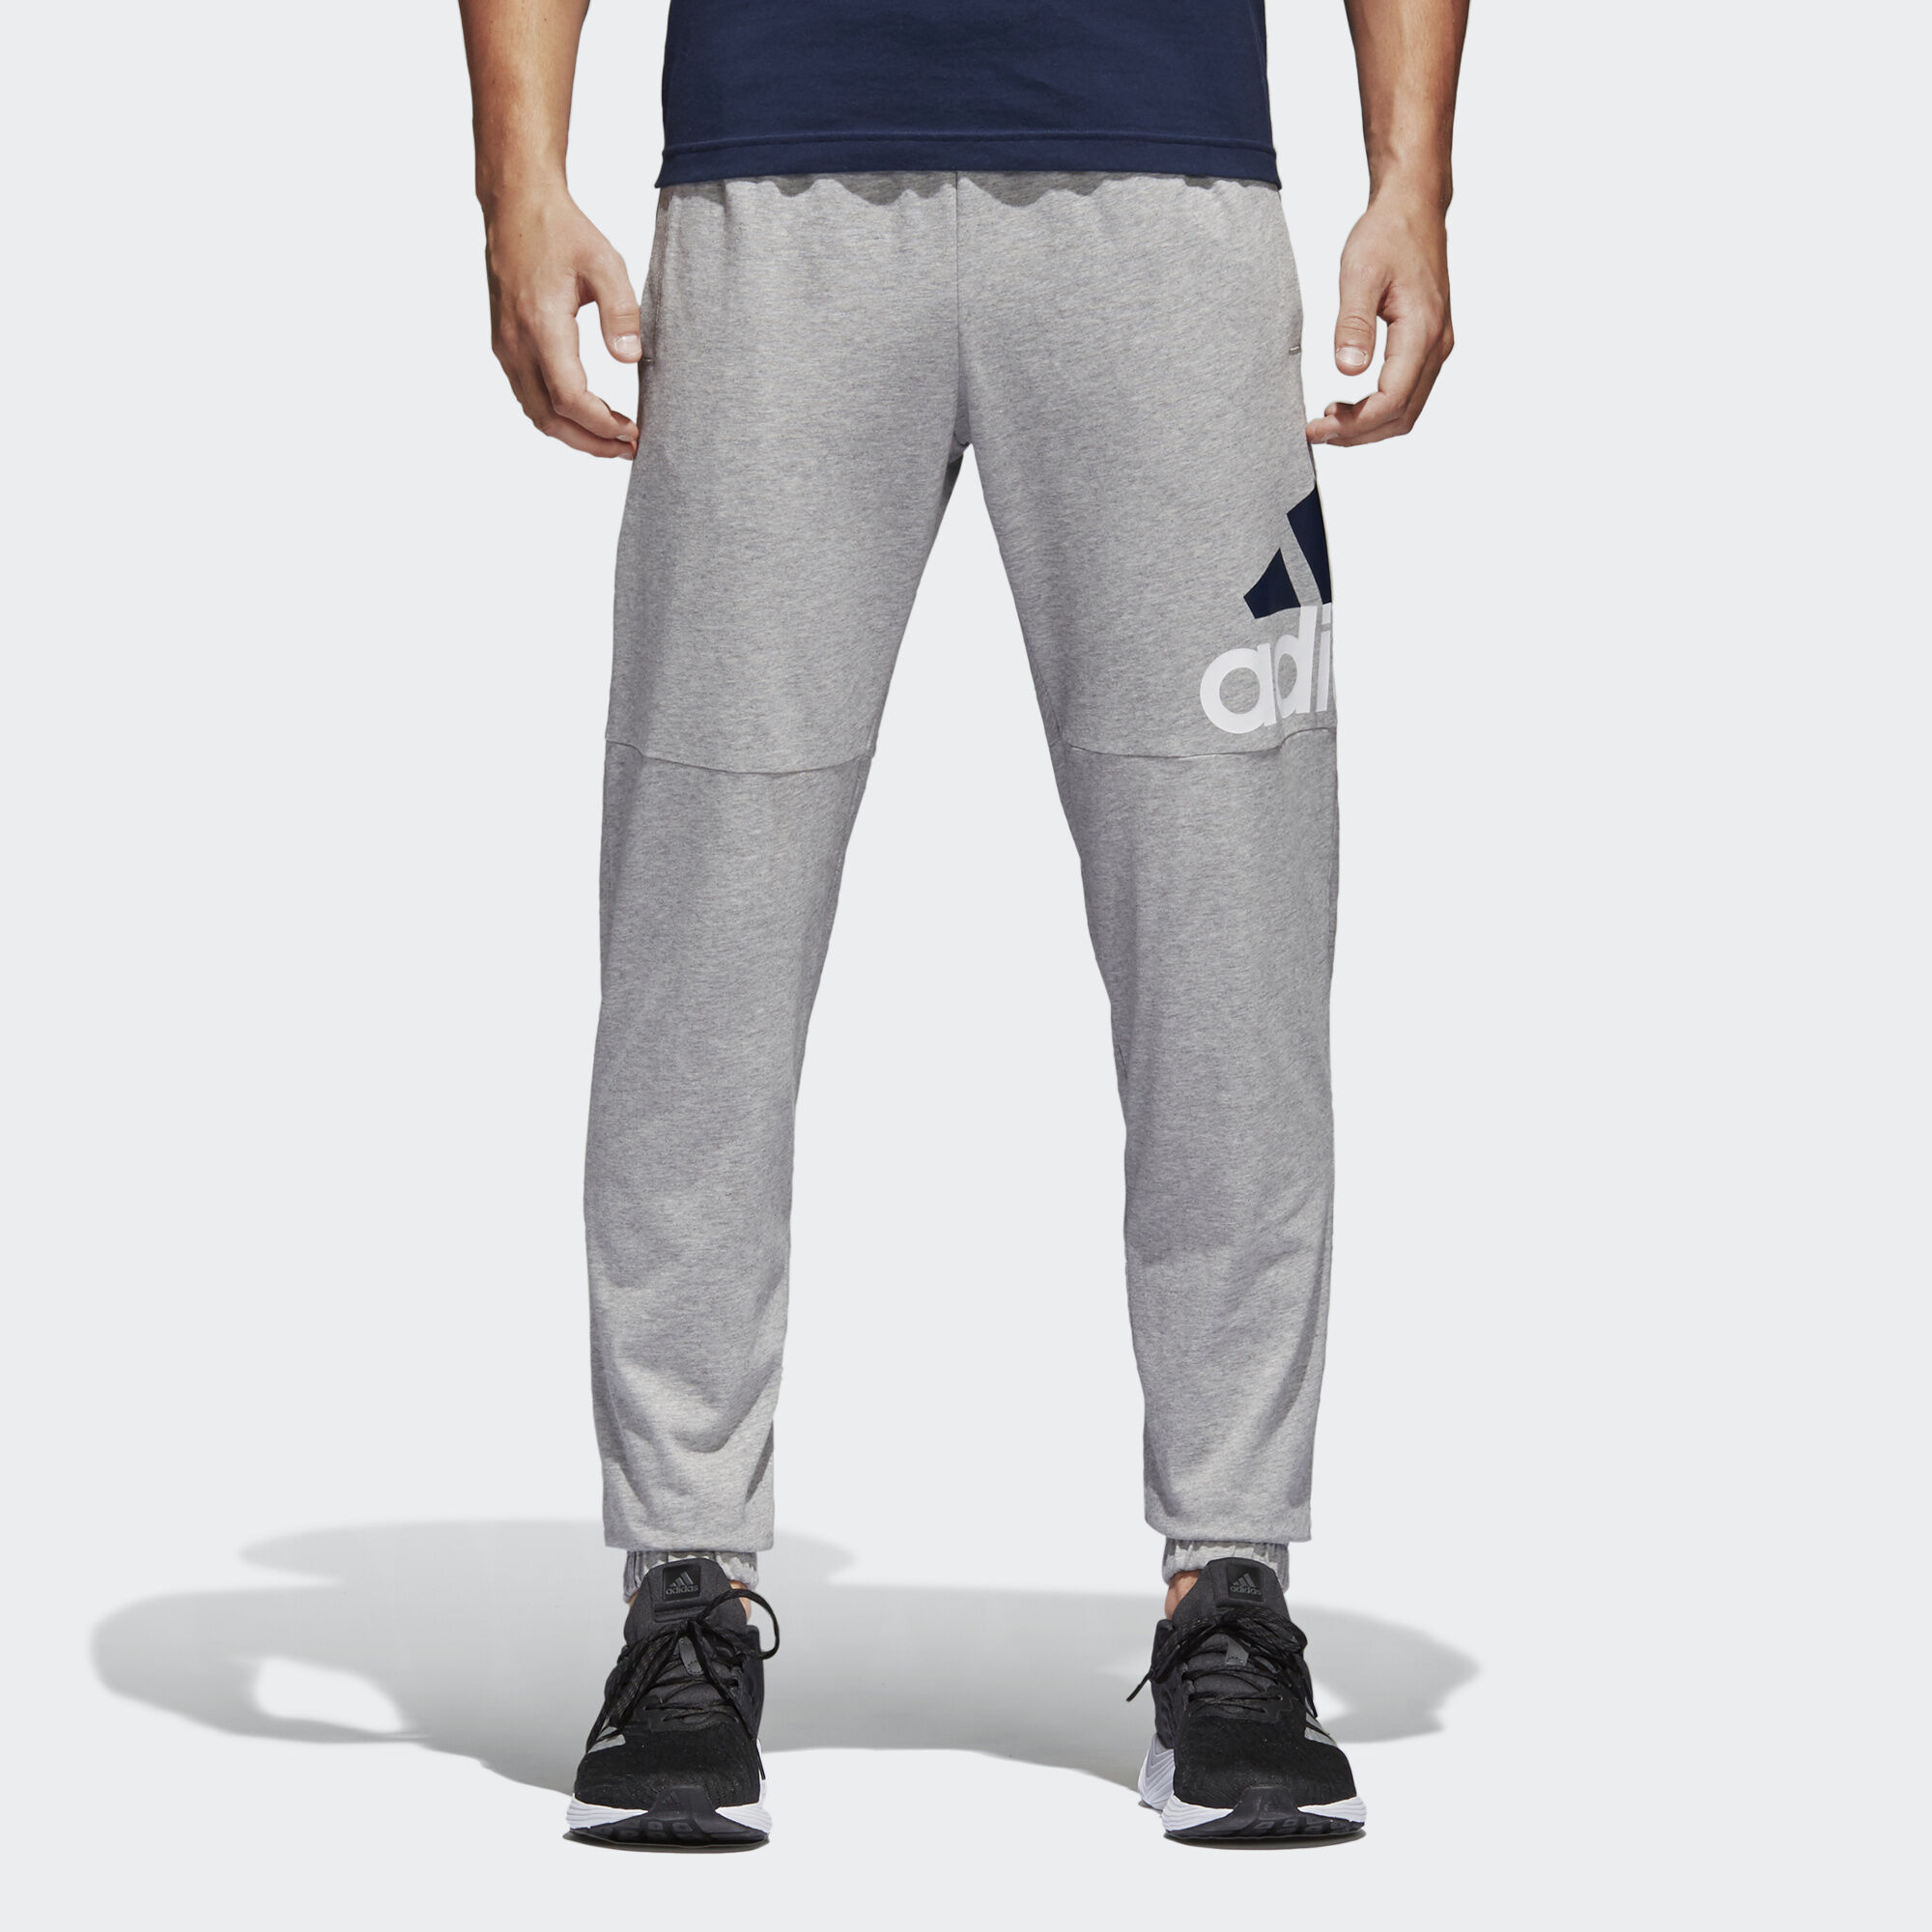 adidas lifter training pants